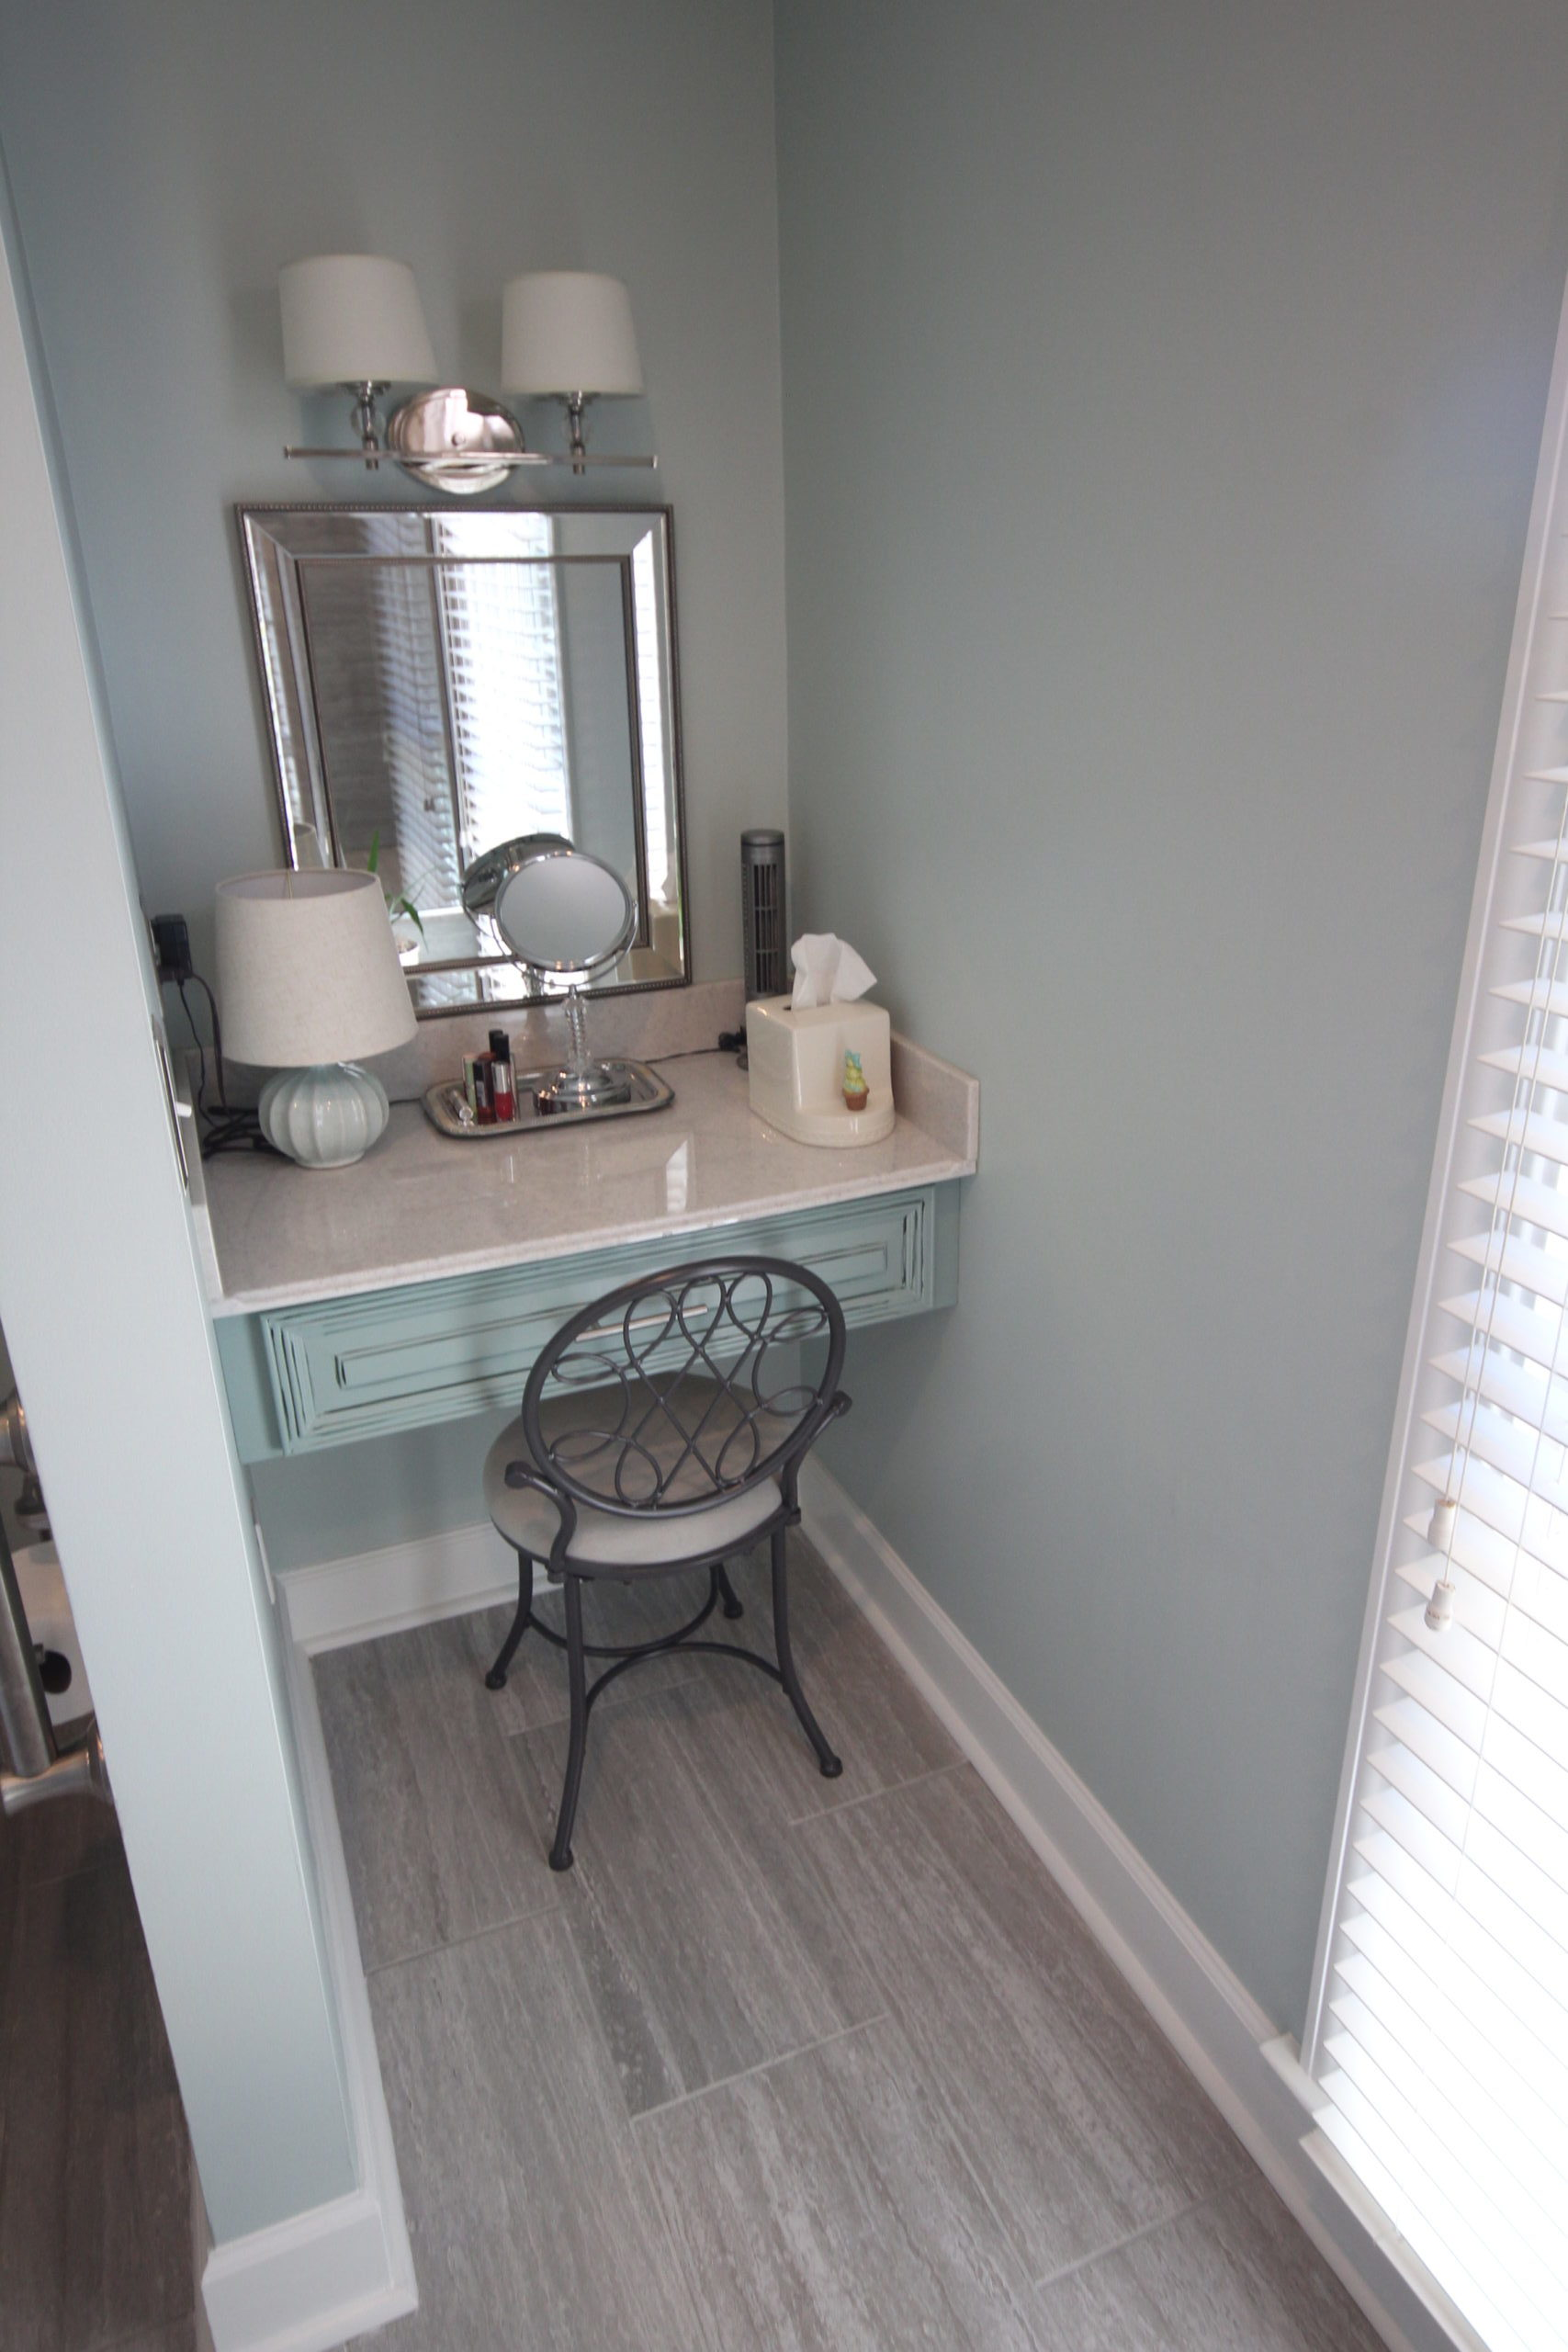 bathroom-remodeling-work-TAG-Builders-232-GV-Bathroom-Remodel-6-scaled-e1586519081237